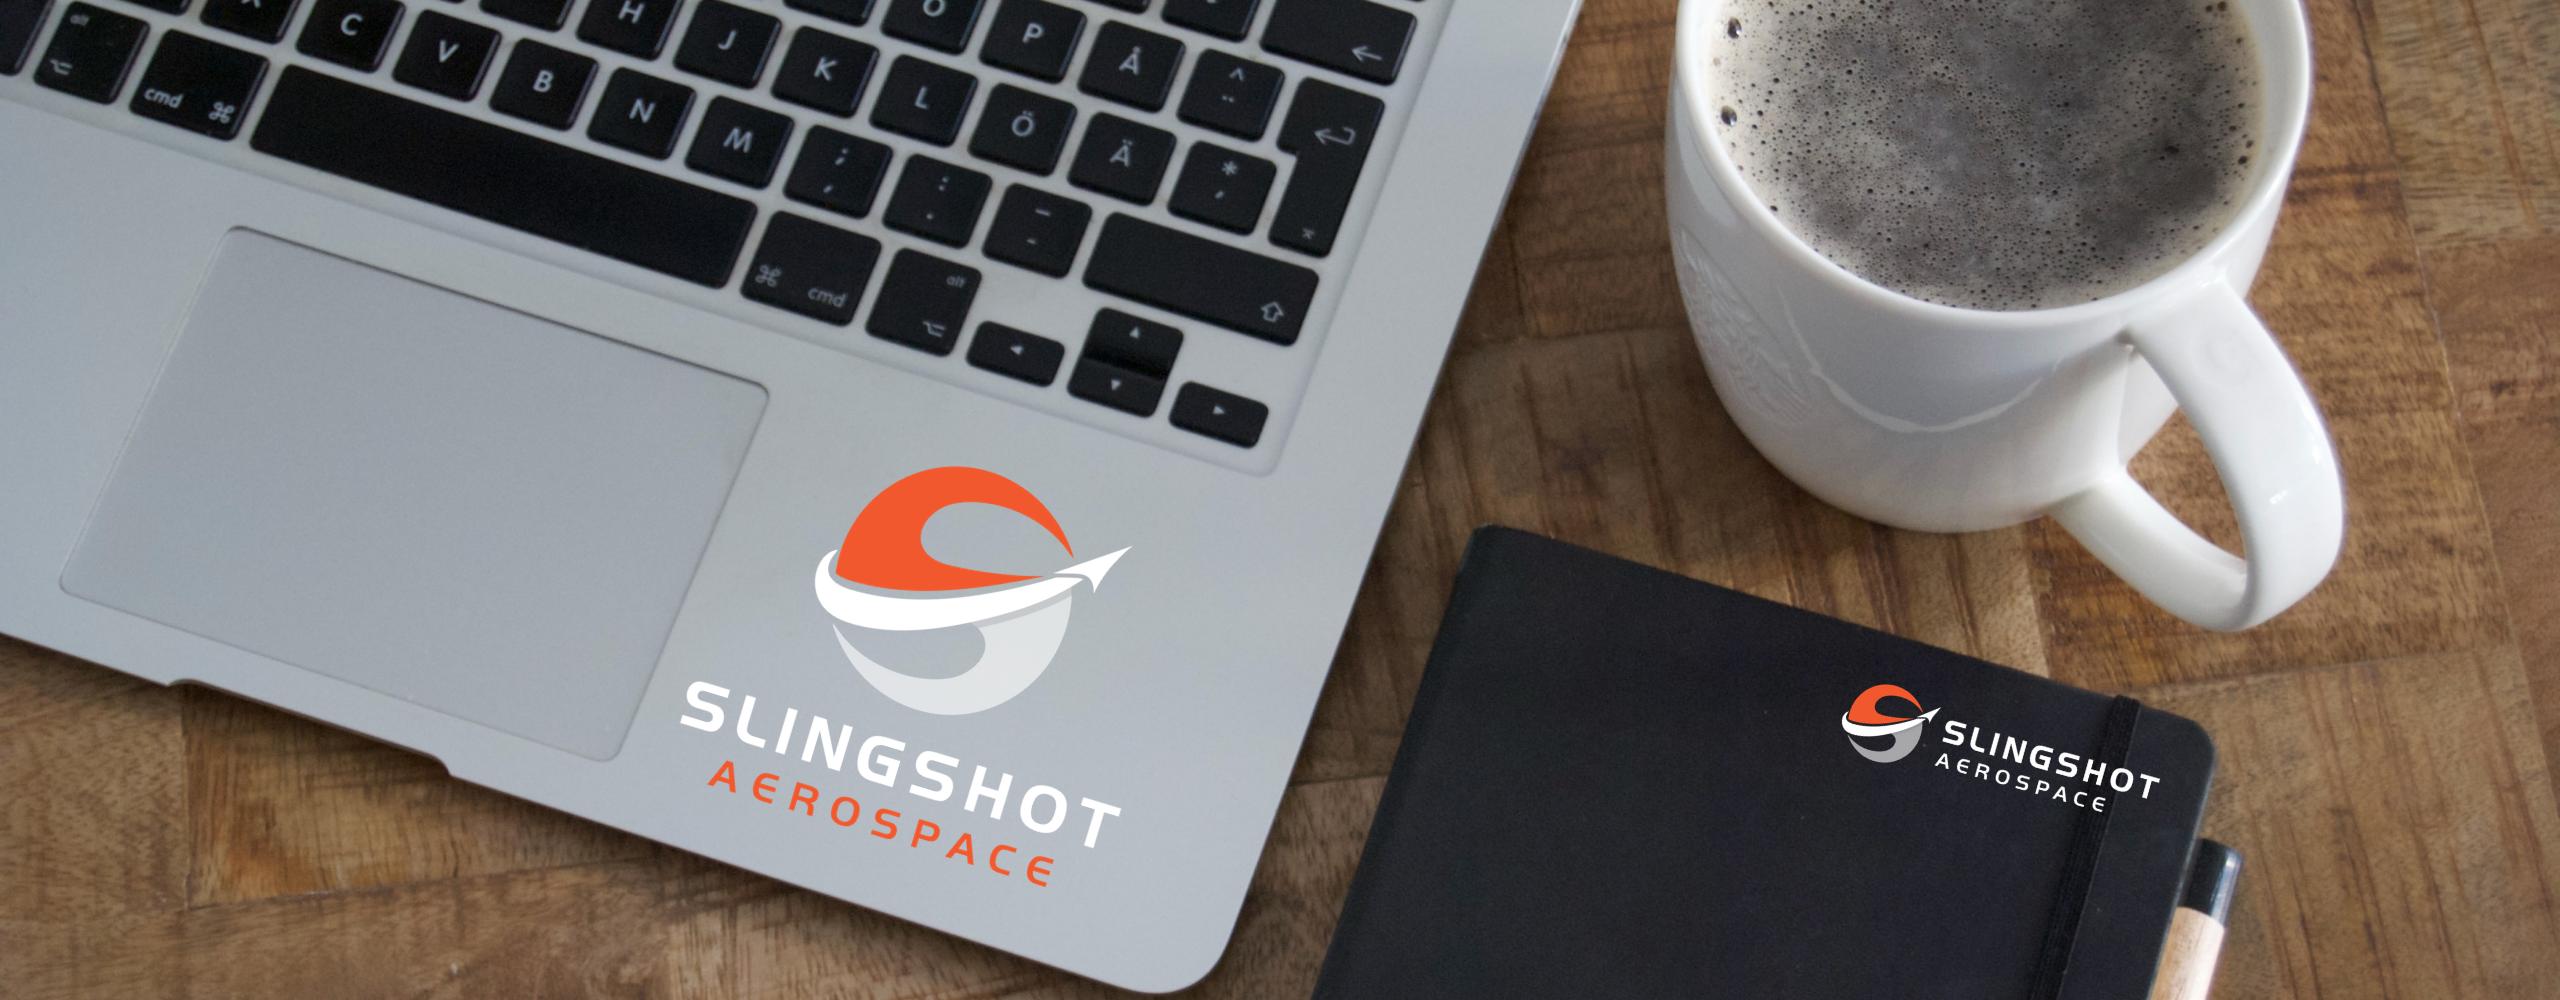 Remote Work at Slingshot Aerospace